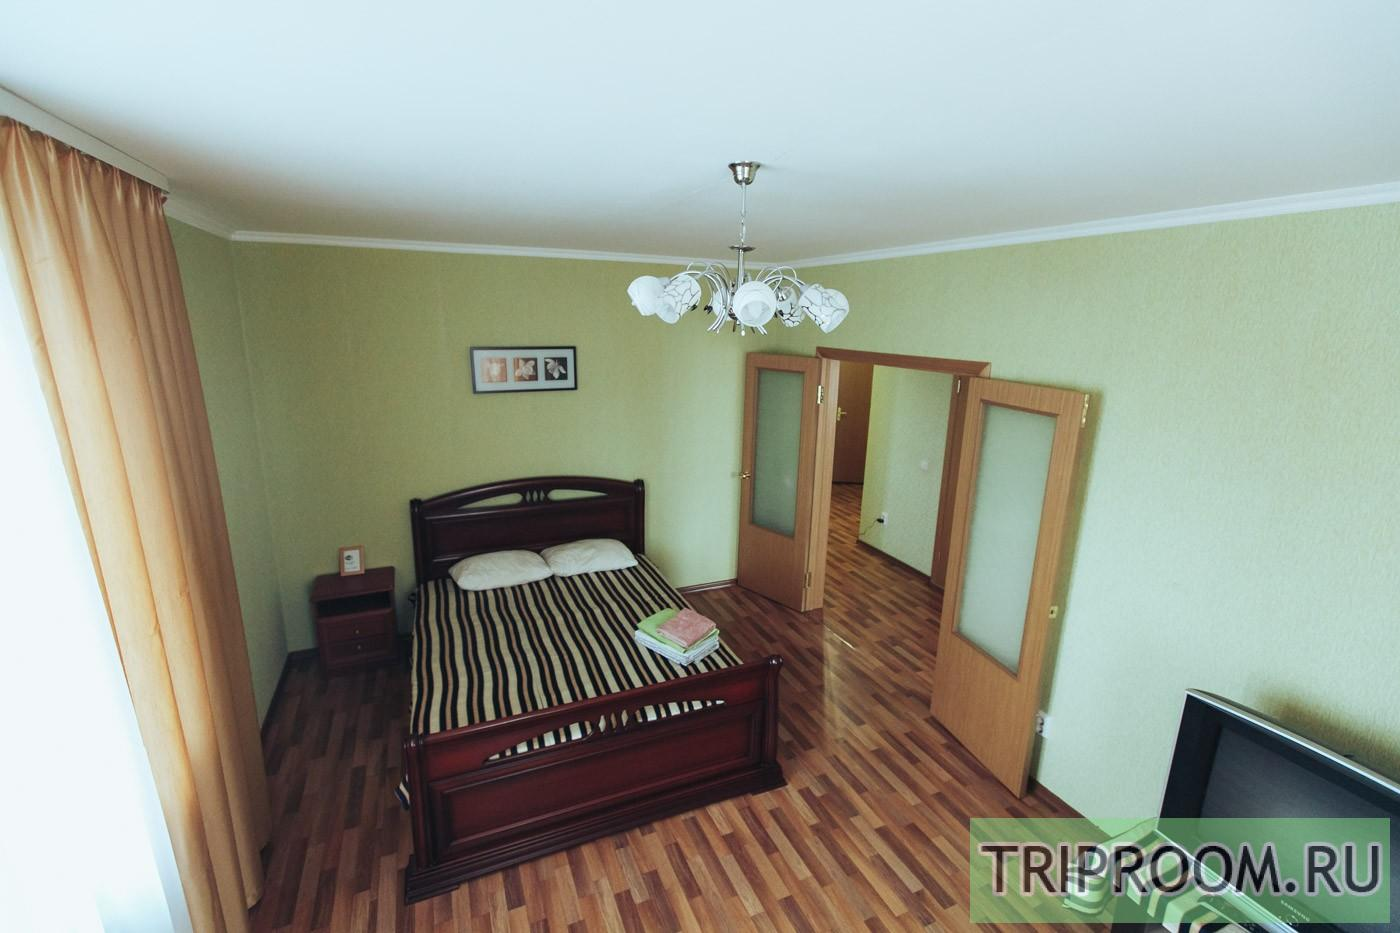 1-комнатная квартира посуточно (вариант № 30979), ул. Петра Смородина улица, фото № 4